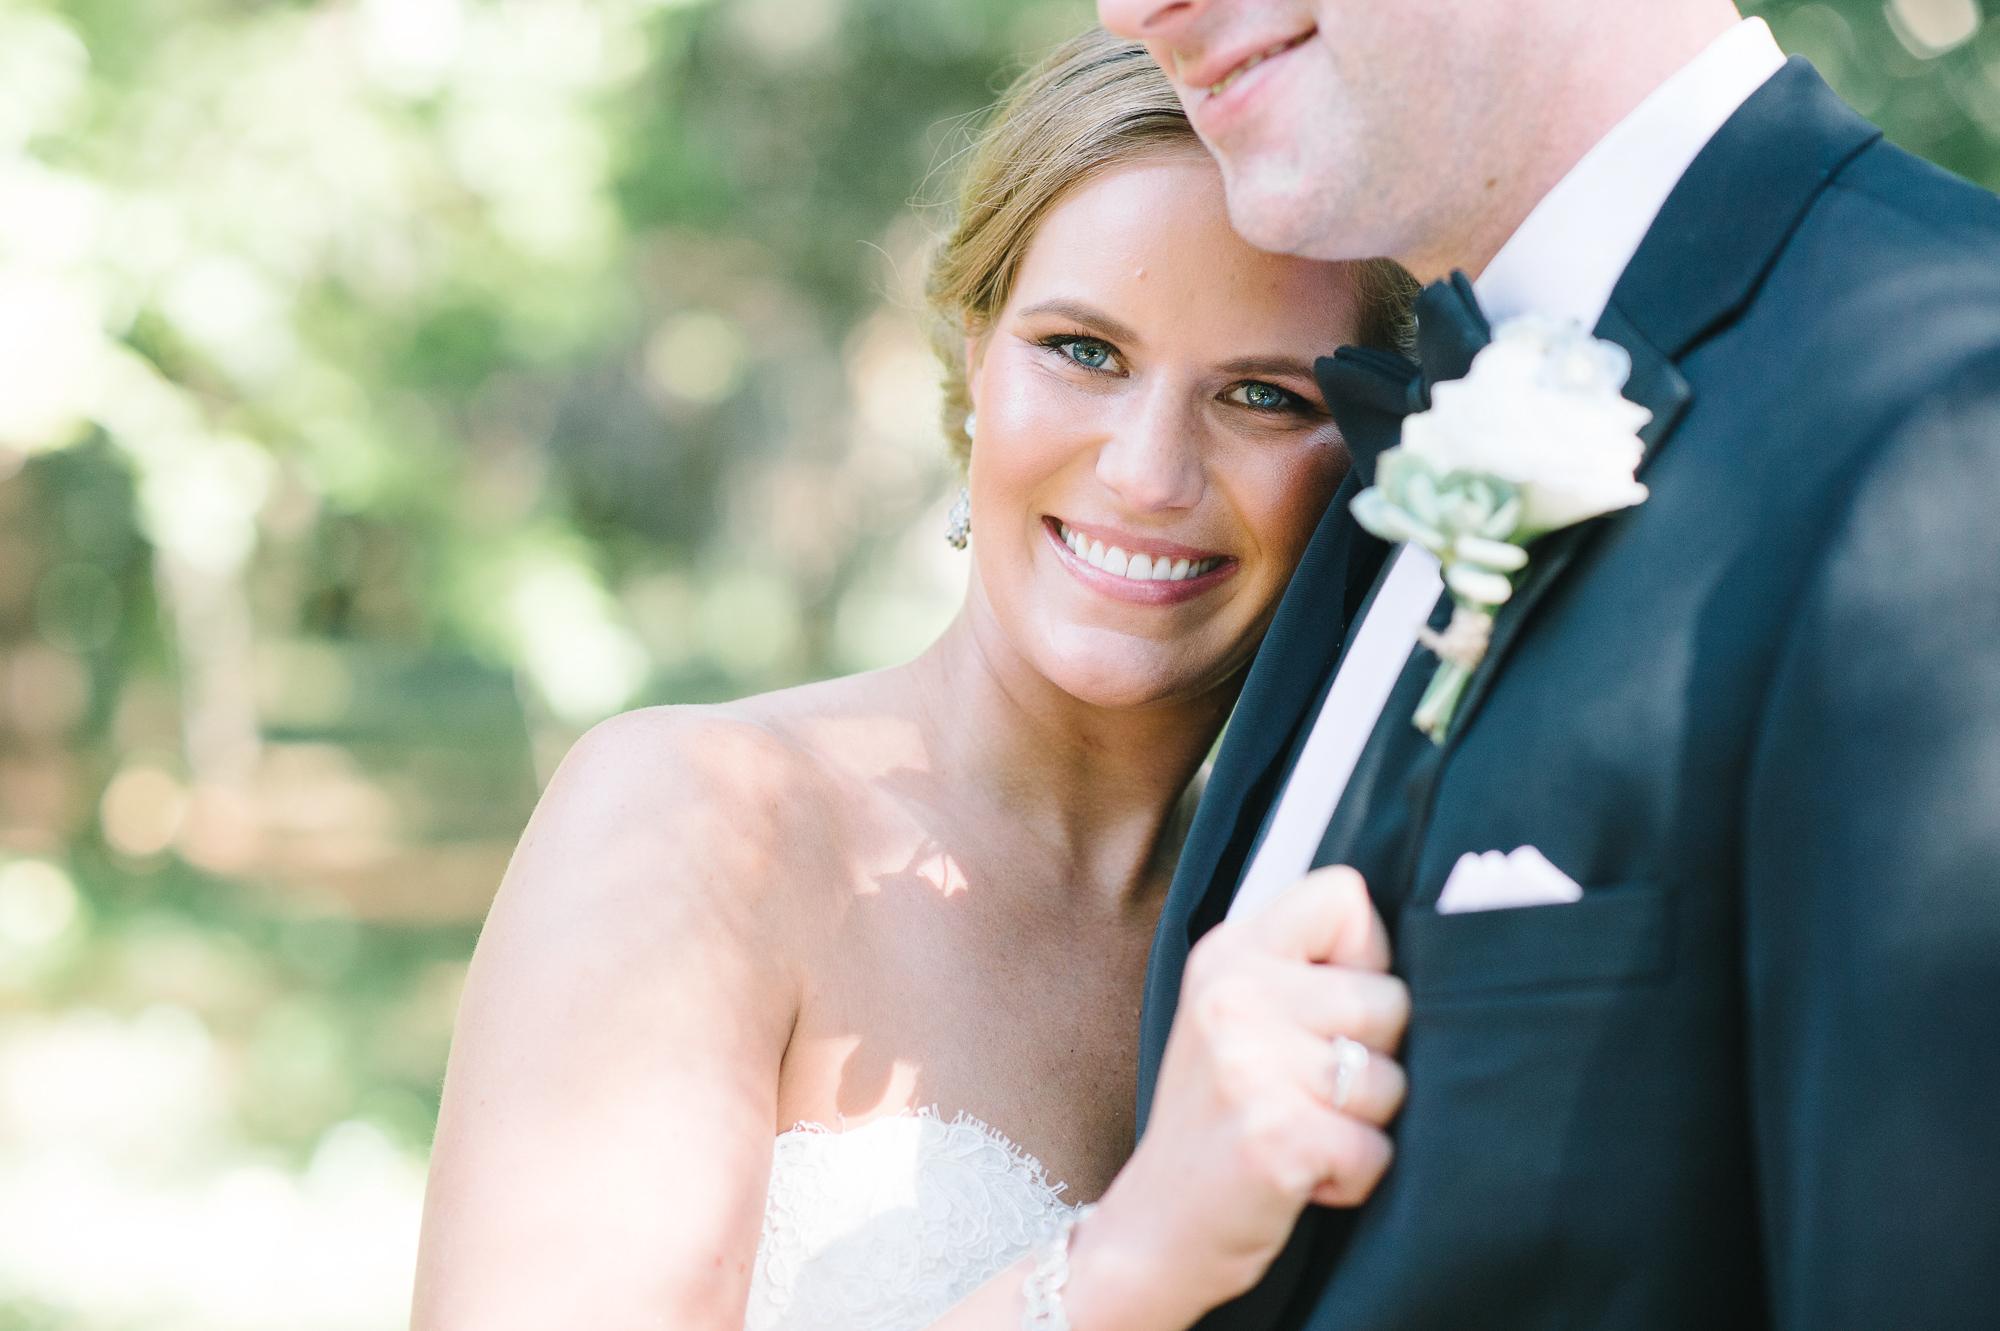 legare-waring-house-wedding-1.jpg